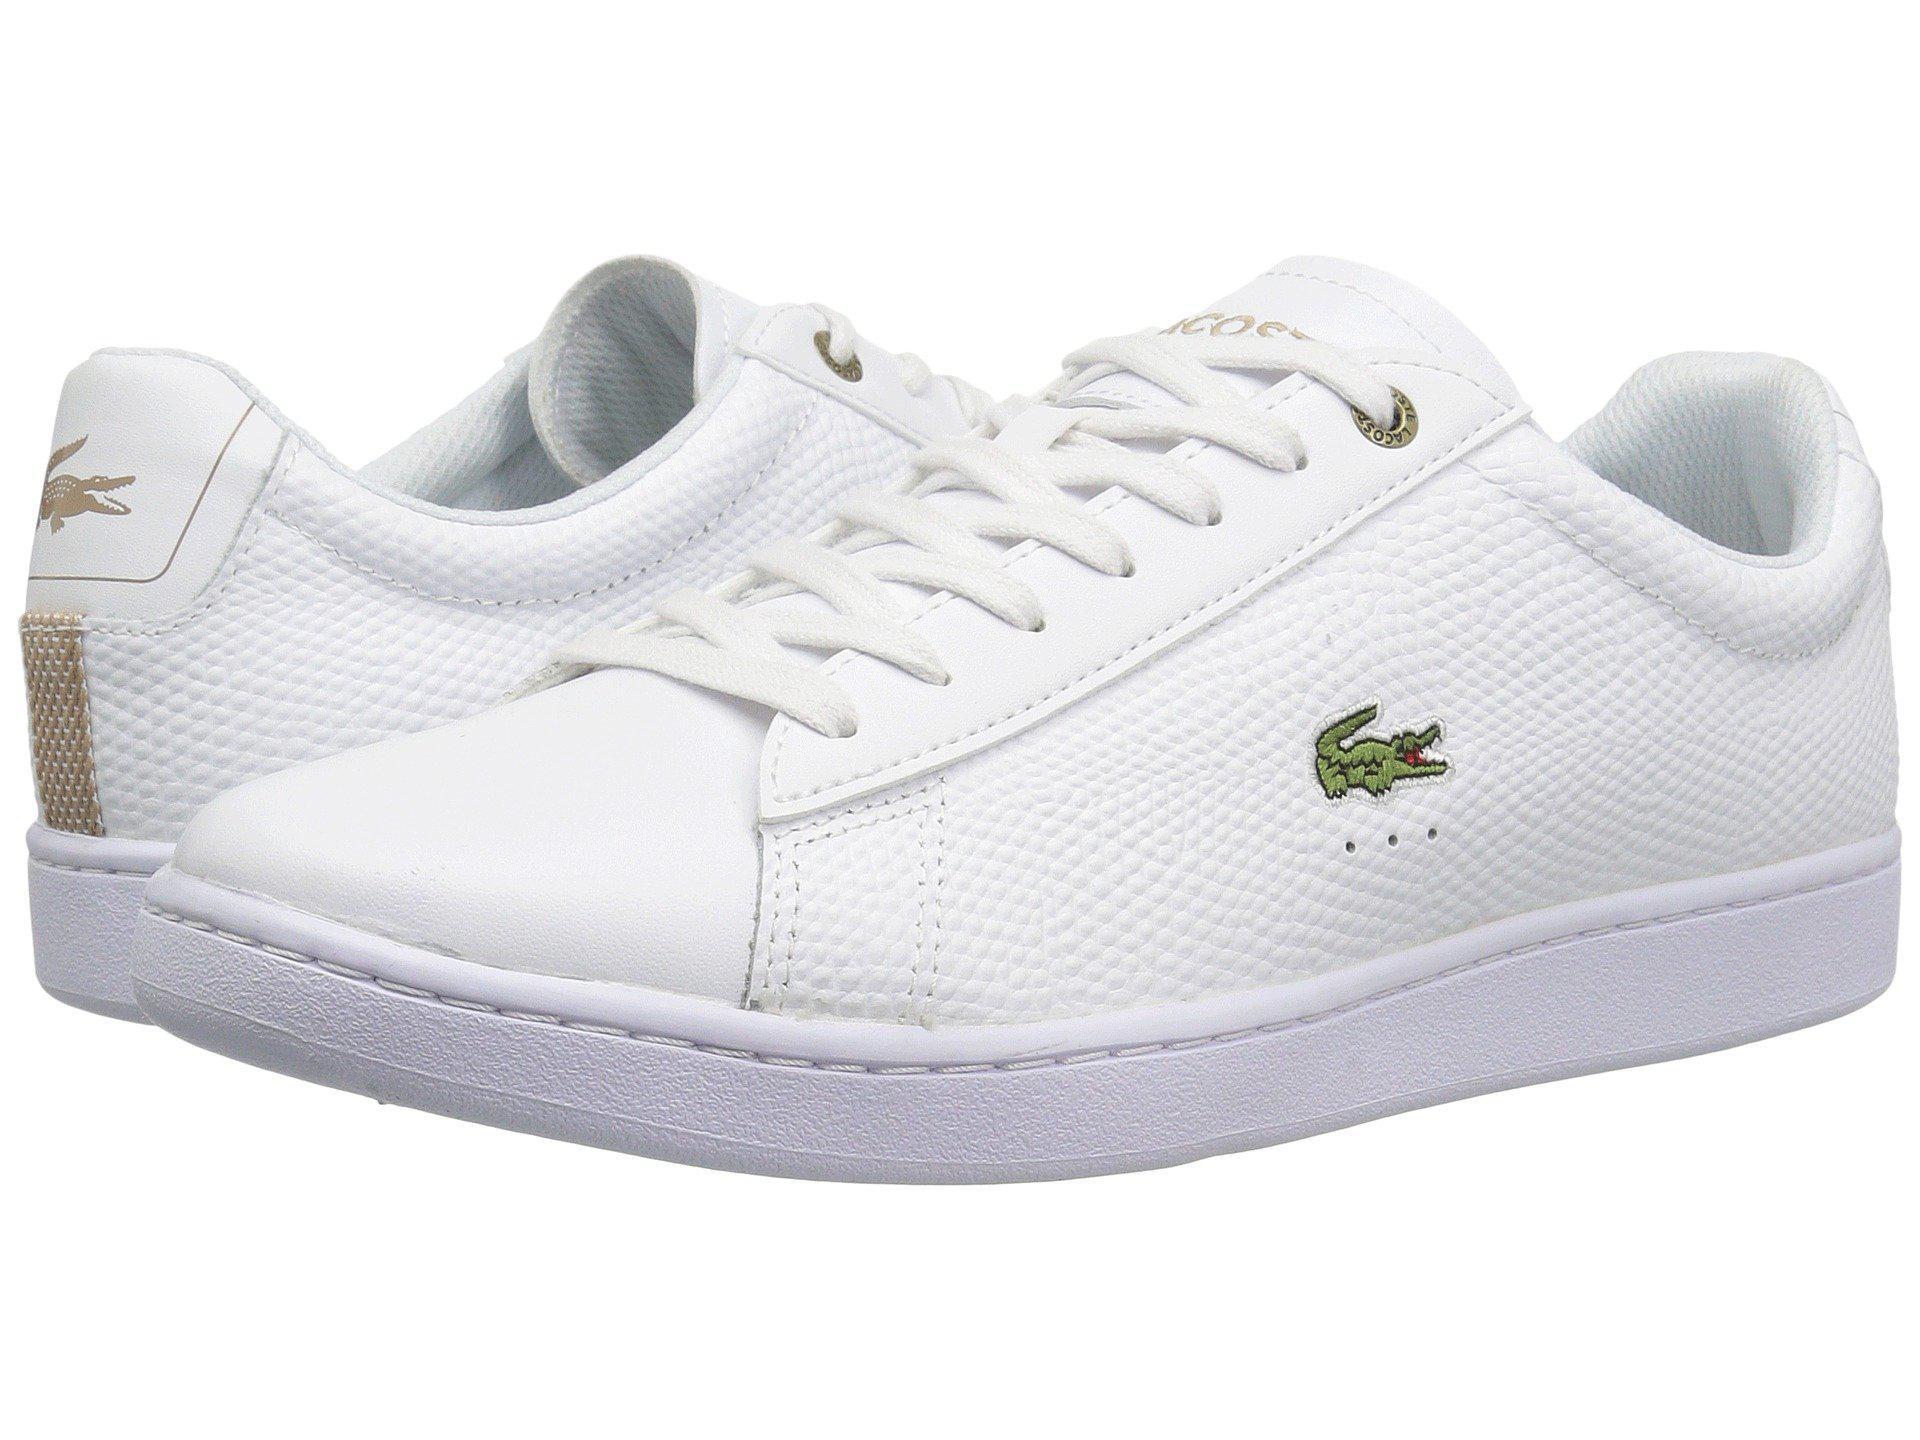 305a20e96e34 Lyst - Lacoste Carnaby Evo 118 2 (navy light Tan) Men s Shoes in ...